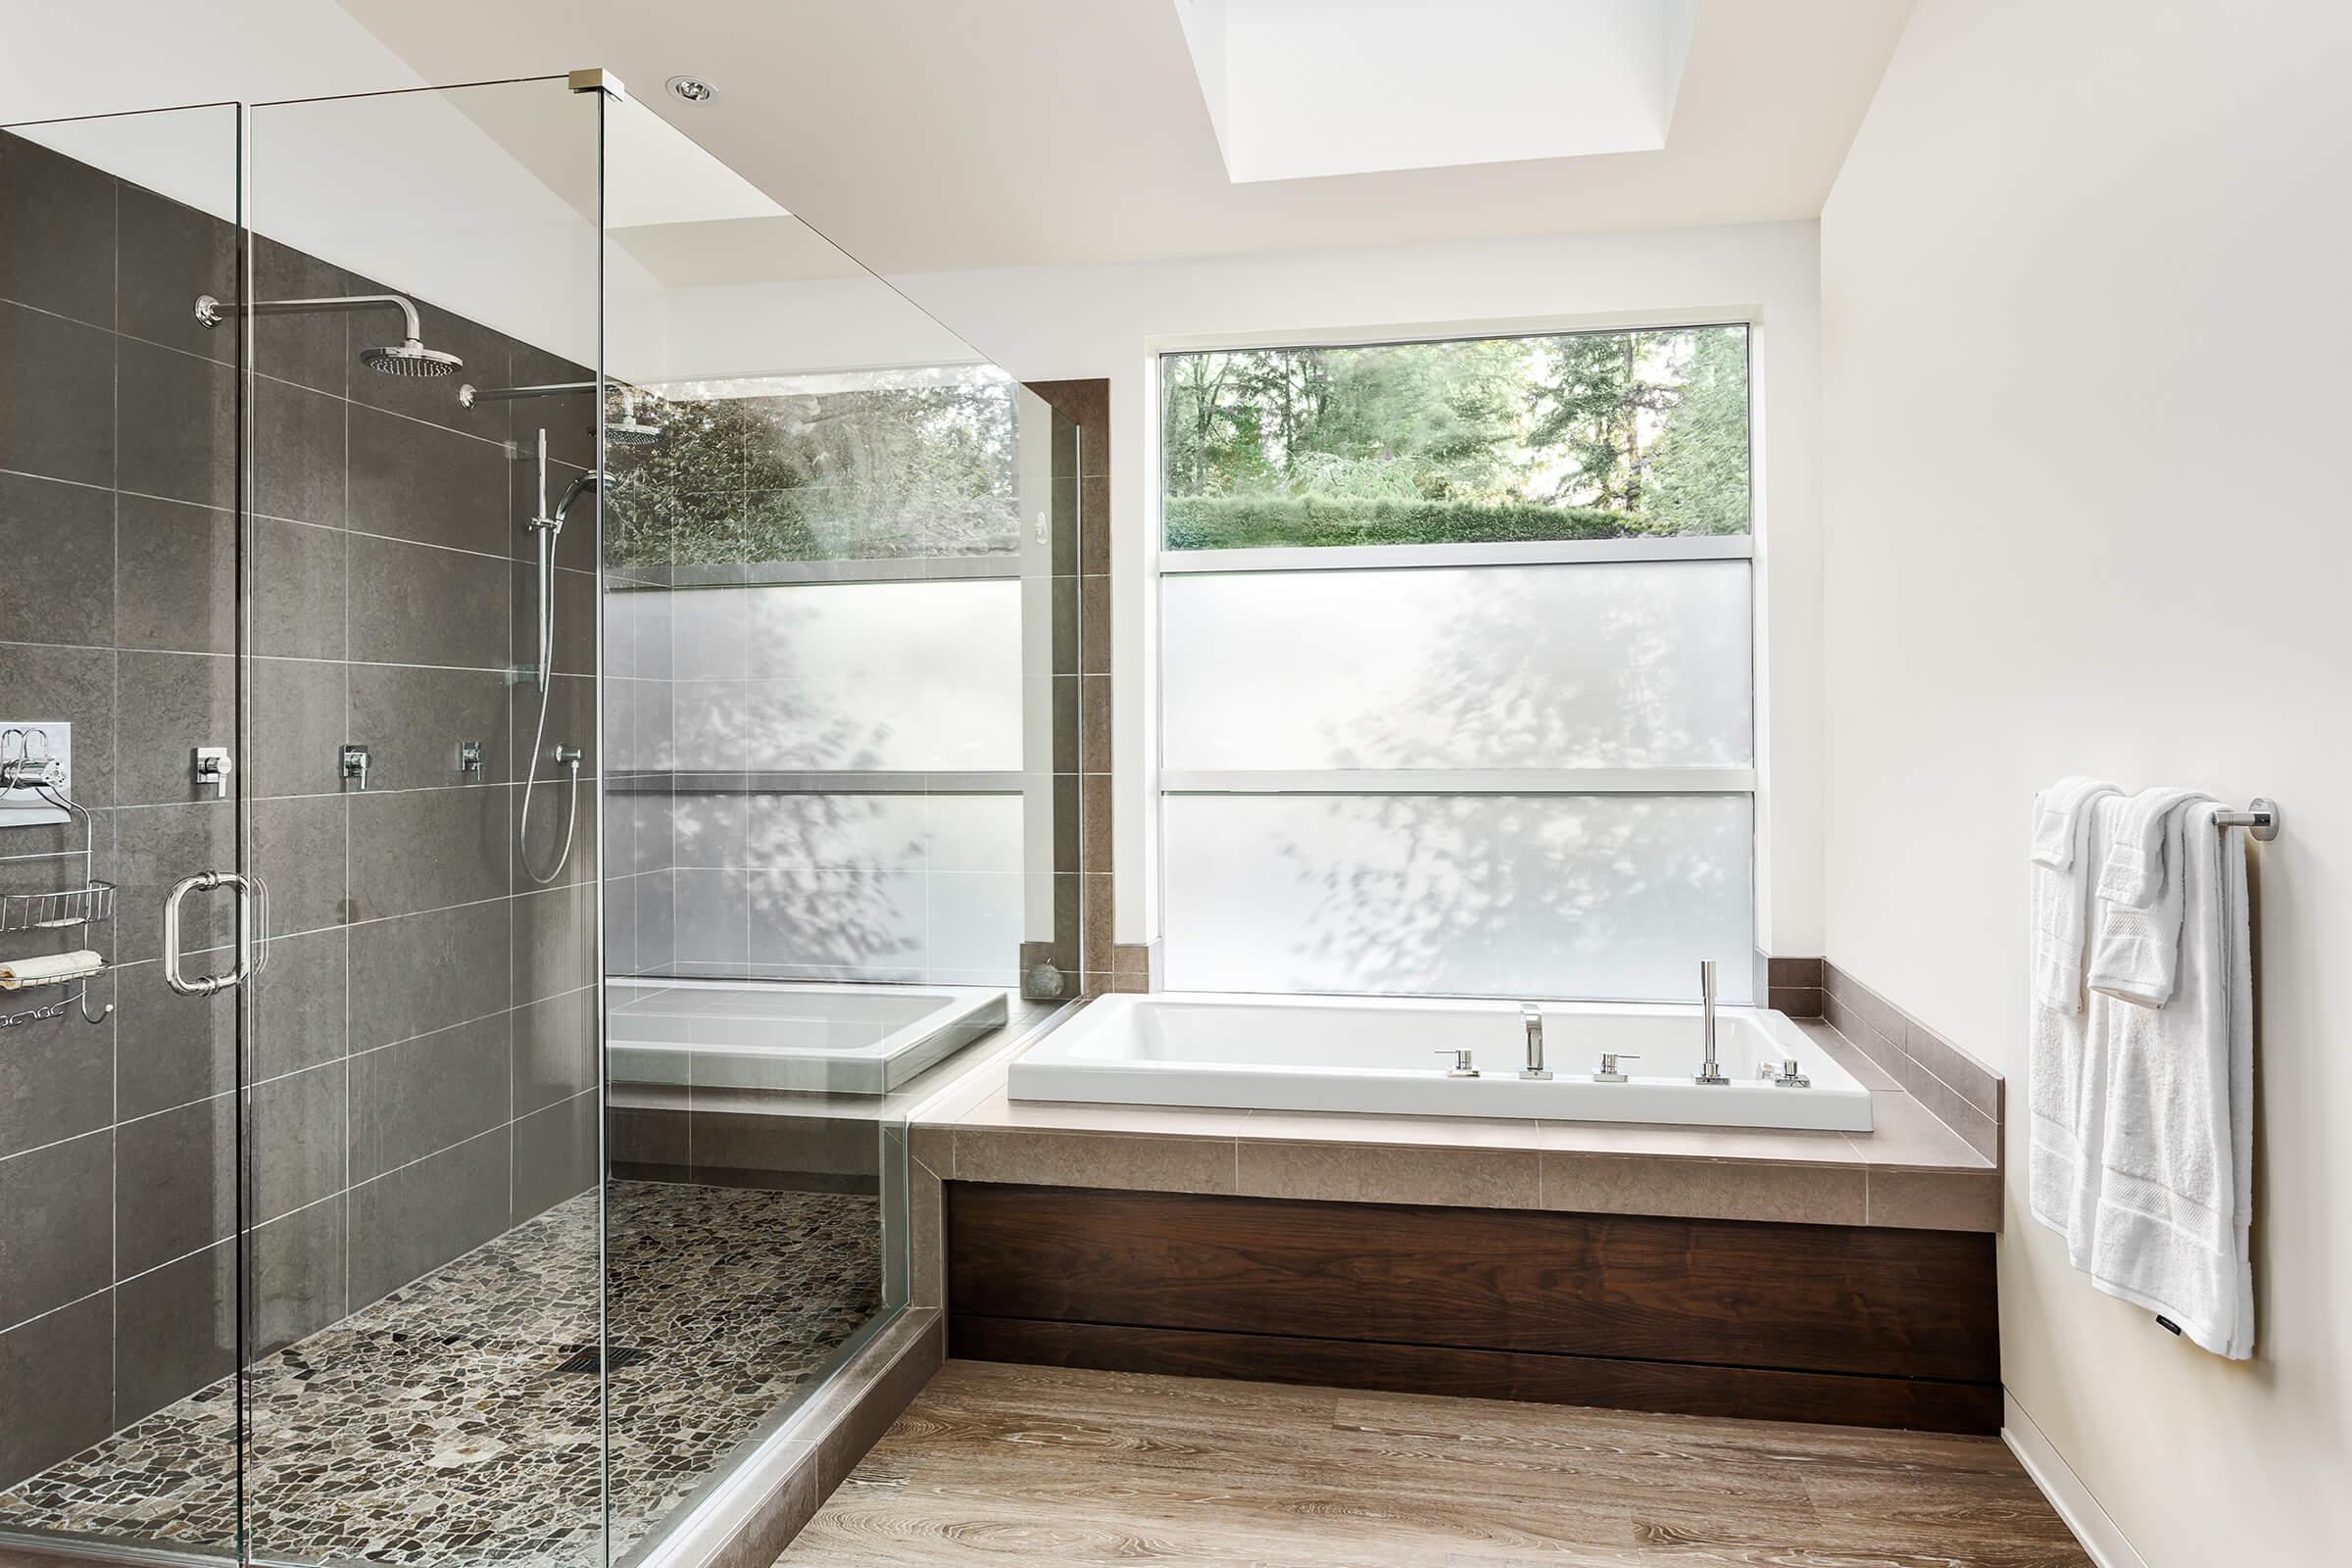 . Bathroom Remodeling Contractors San Jose   Home Tech Construction